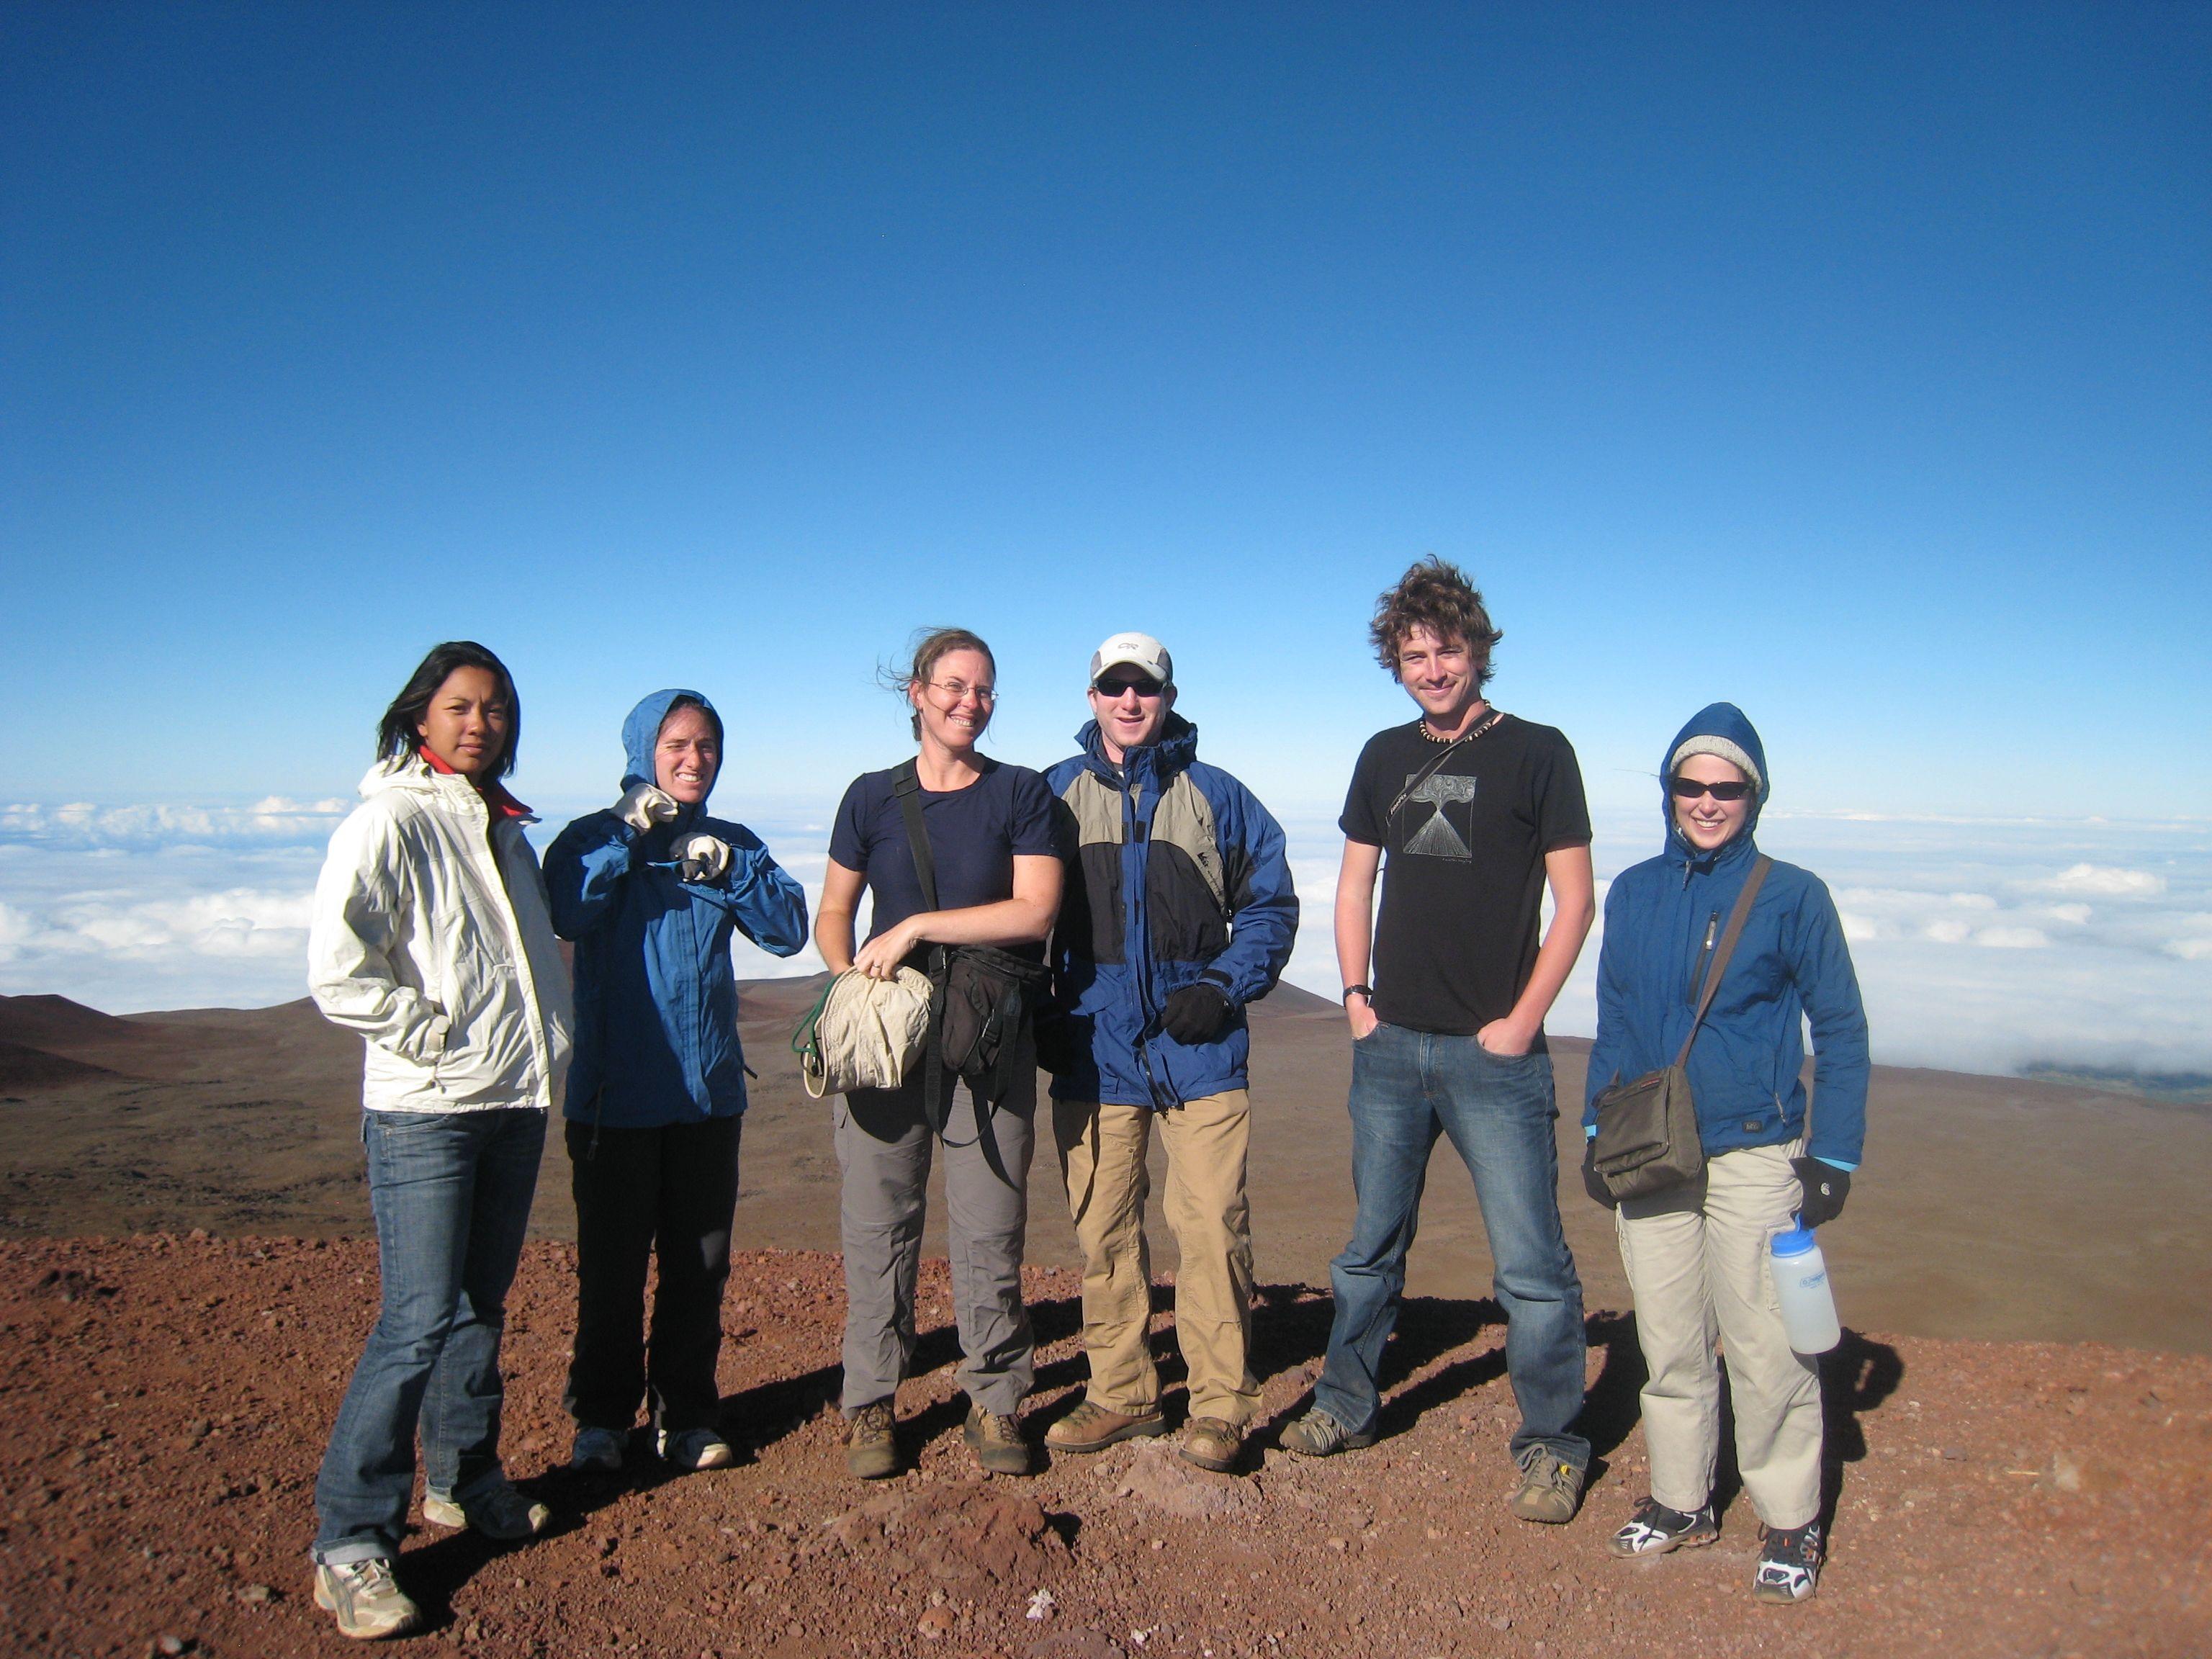 Field team on top of Mauna Kea Volcano during field work, Summer 2009 [from left: Sam Nakata (WHOI), Hannah Dietterich (U. Oregon), Einat Lev (LDEO, U. Columbia), Adam Soule (WHOI), Jess Robertson (ANU), Natalia Deligne (U. Oregon)] (K. Cashman, U. Oregon).